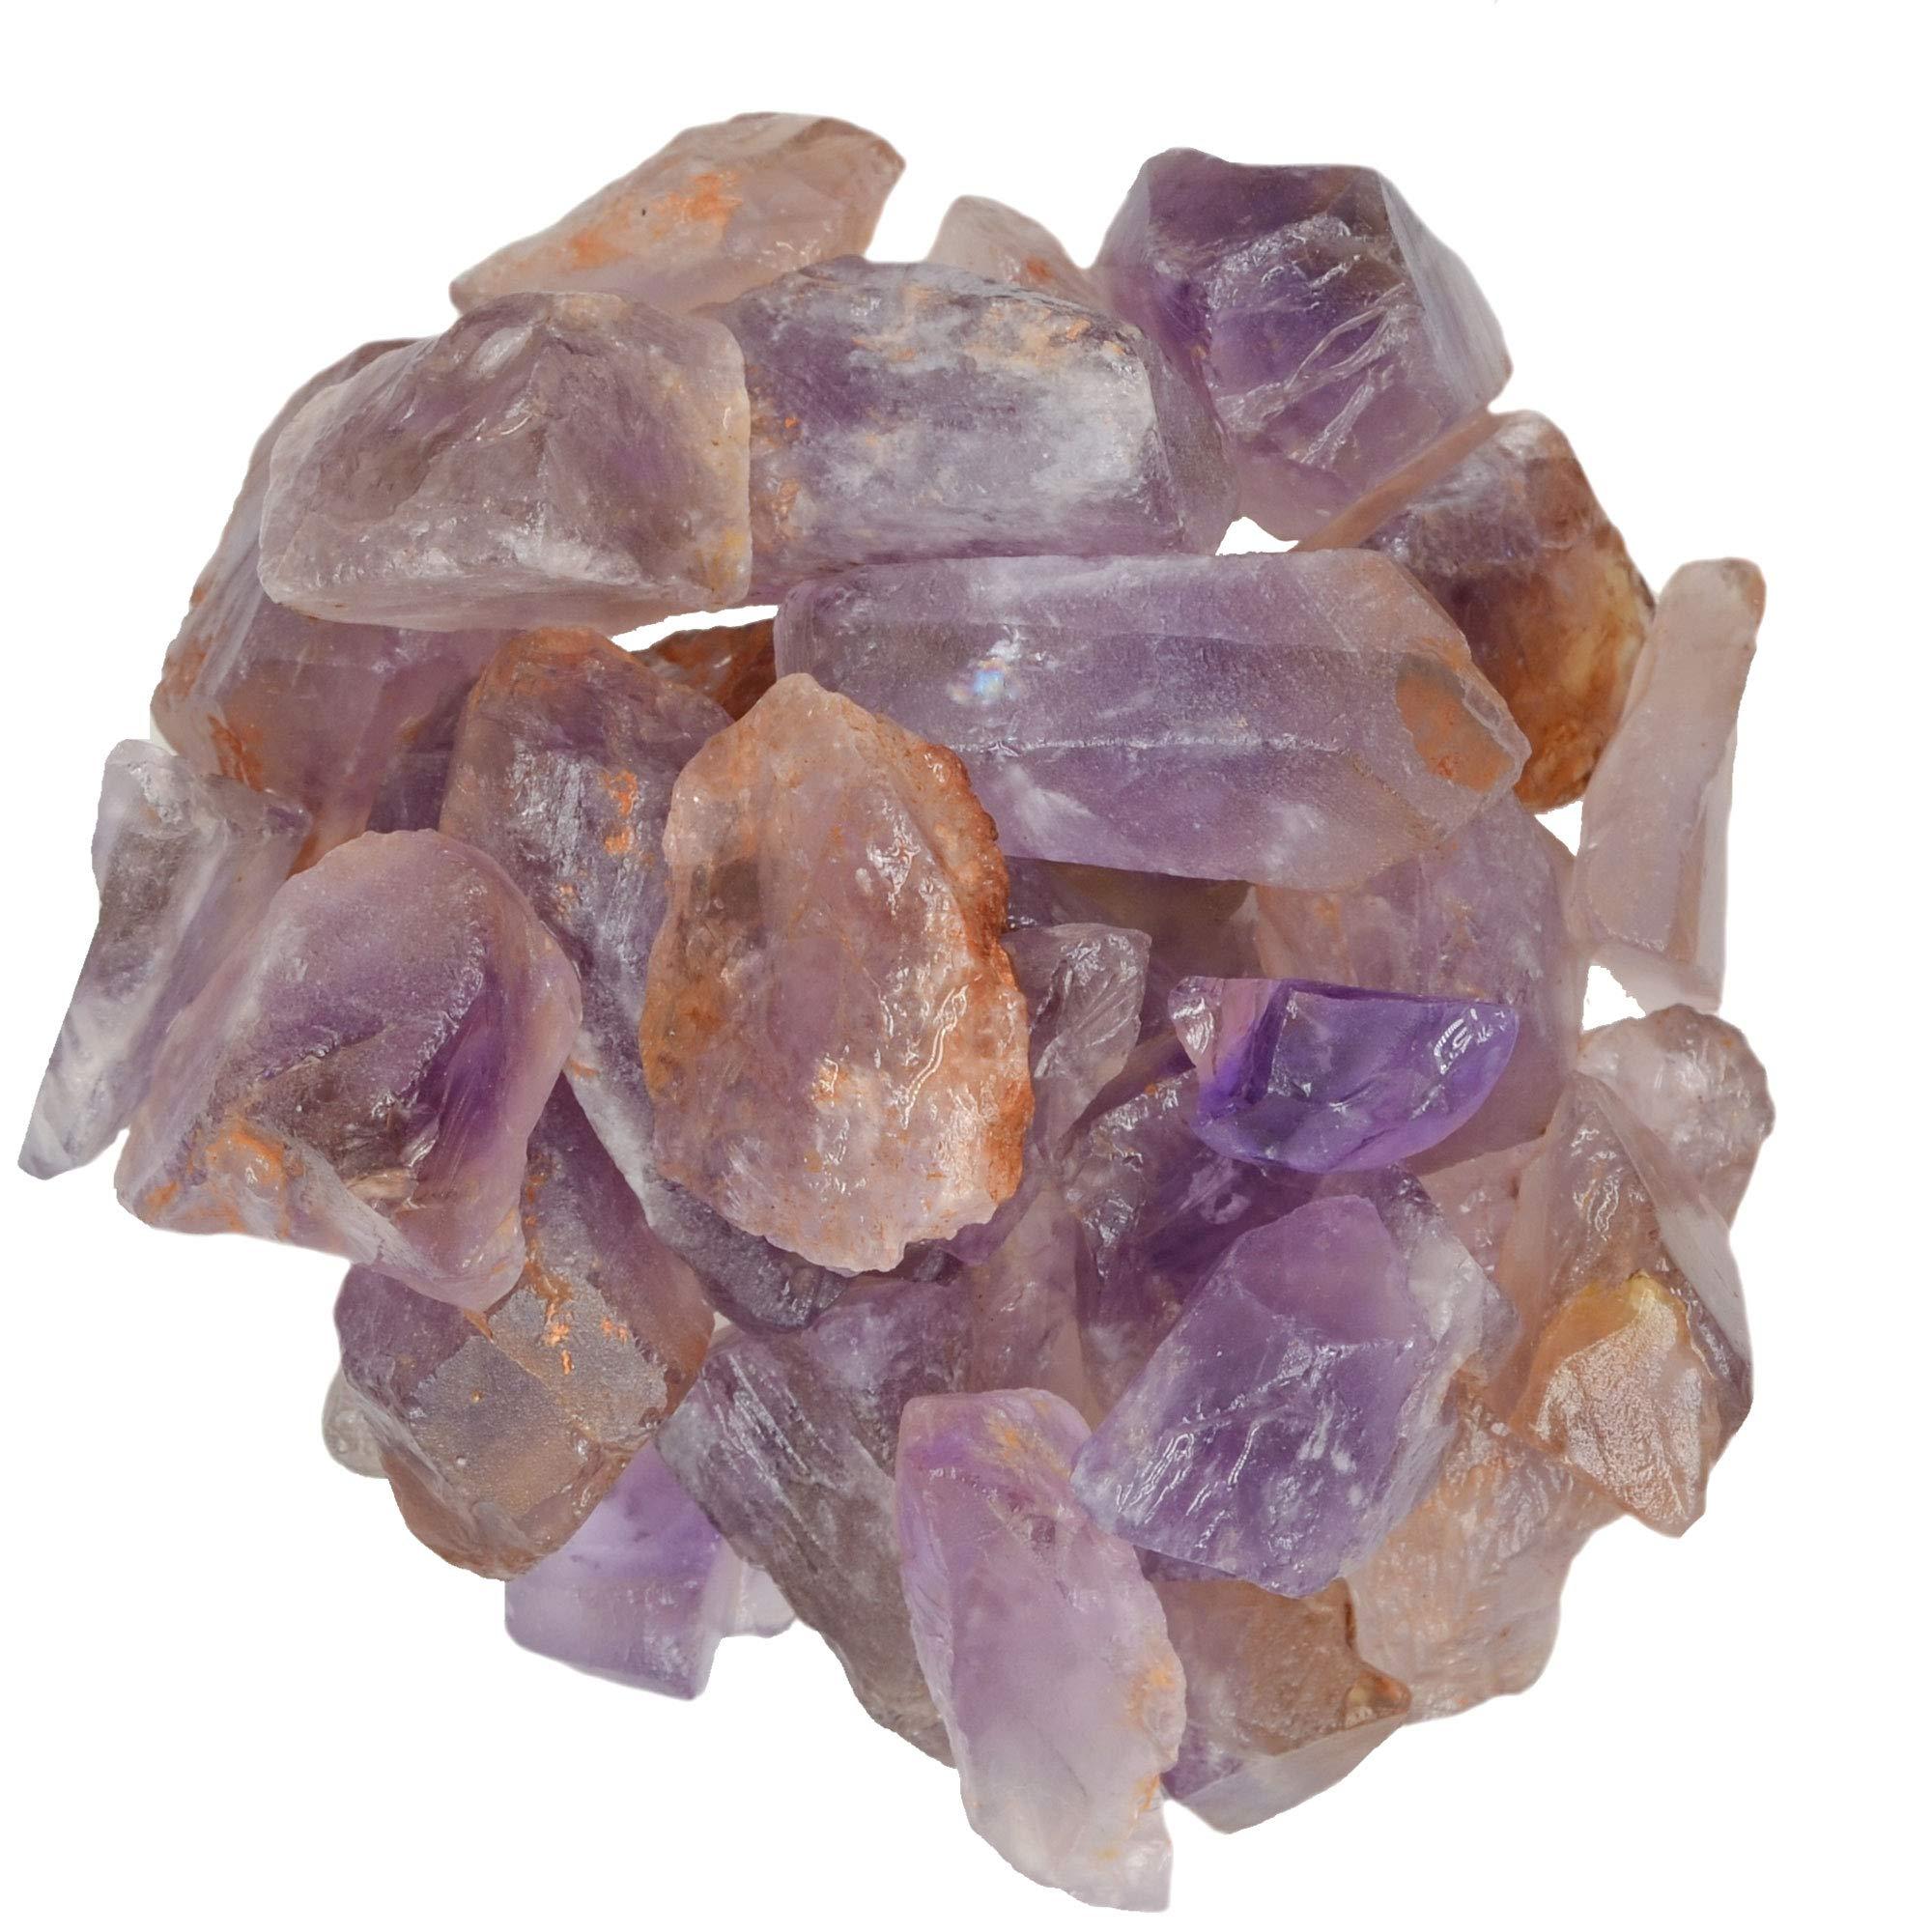 Pink Opal all natural mine rough Peru 5 pound lots 1-4 inch